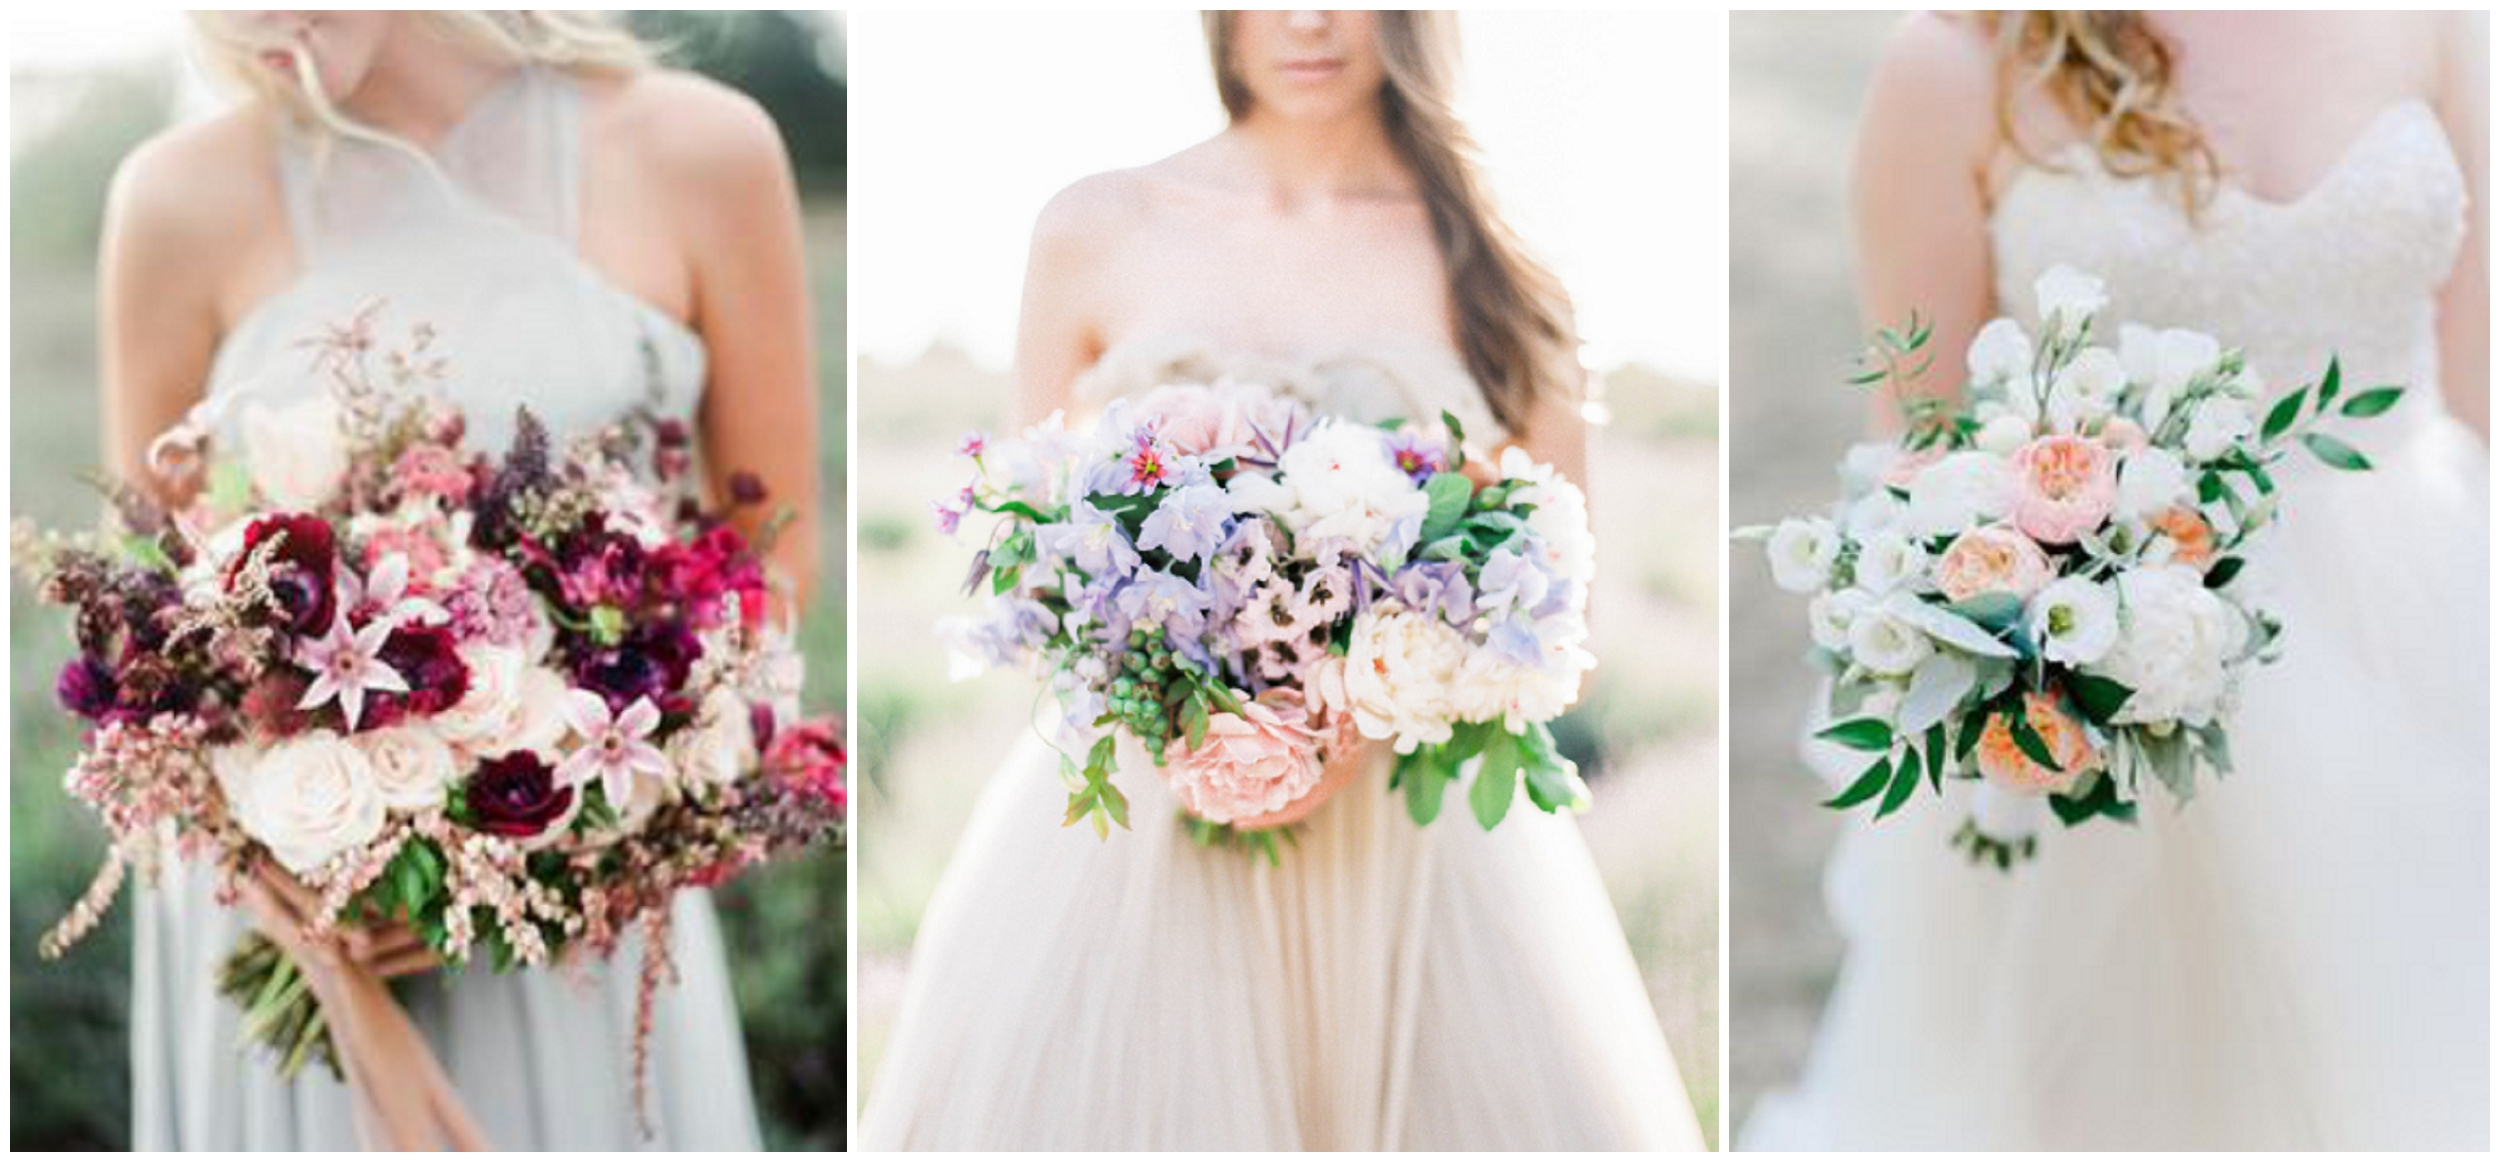 maria+rao+wedding+photographer+portugal_0168.jpg